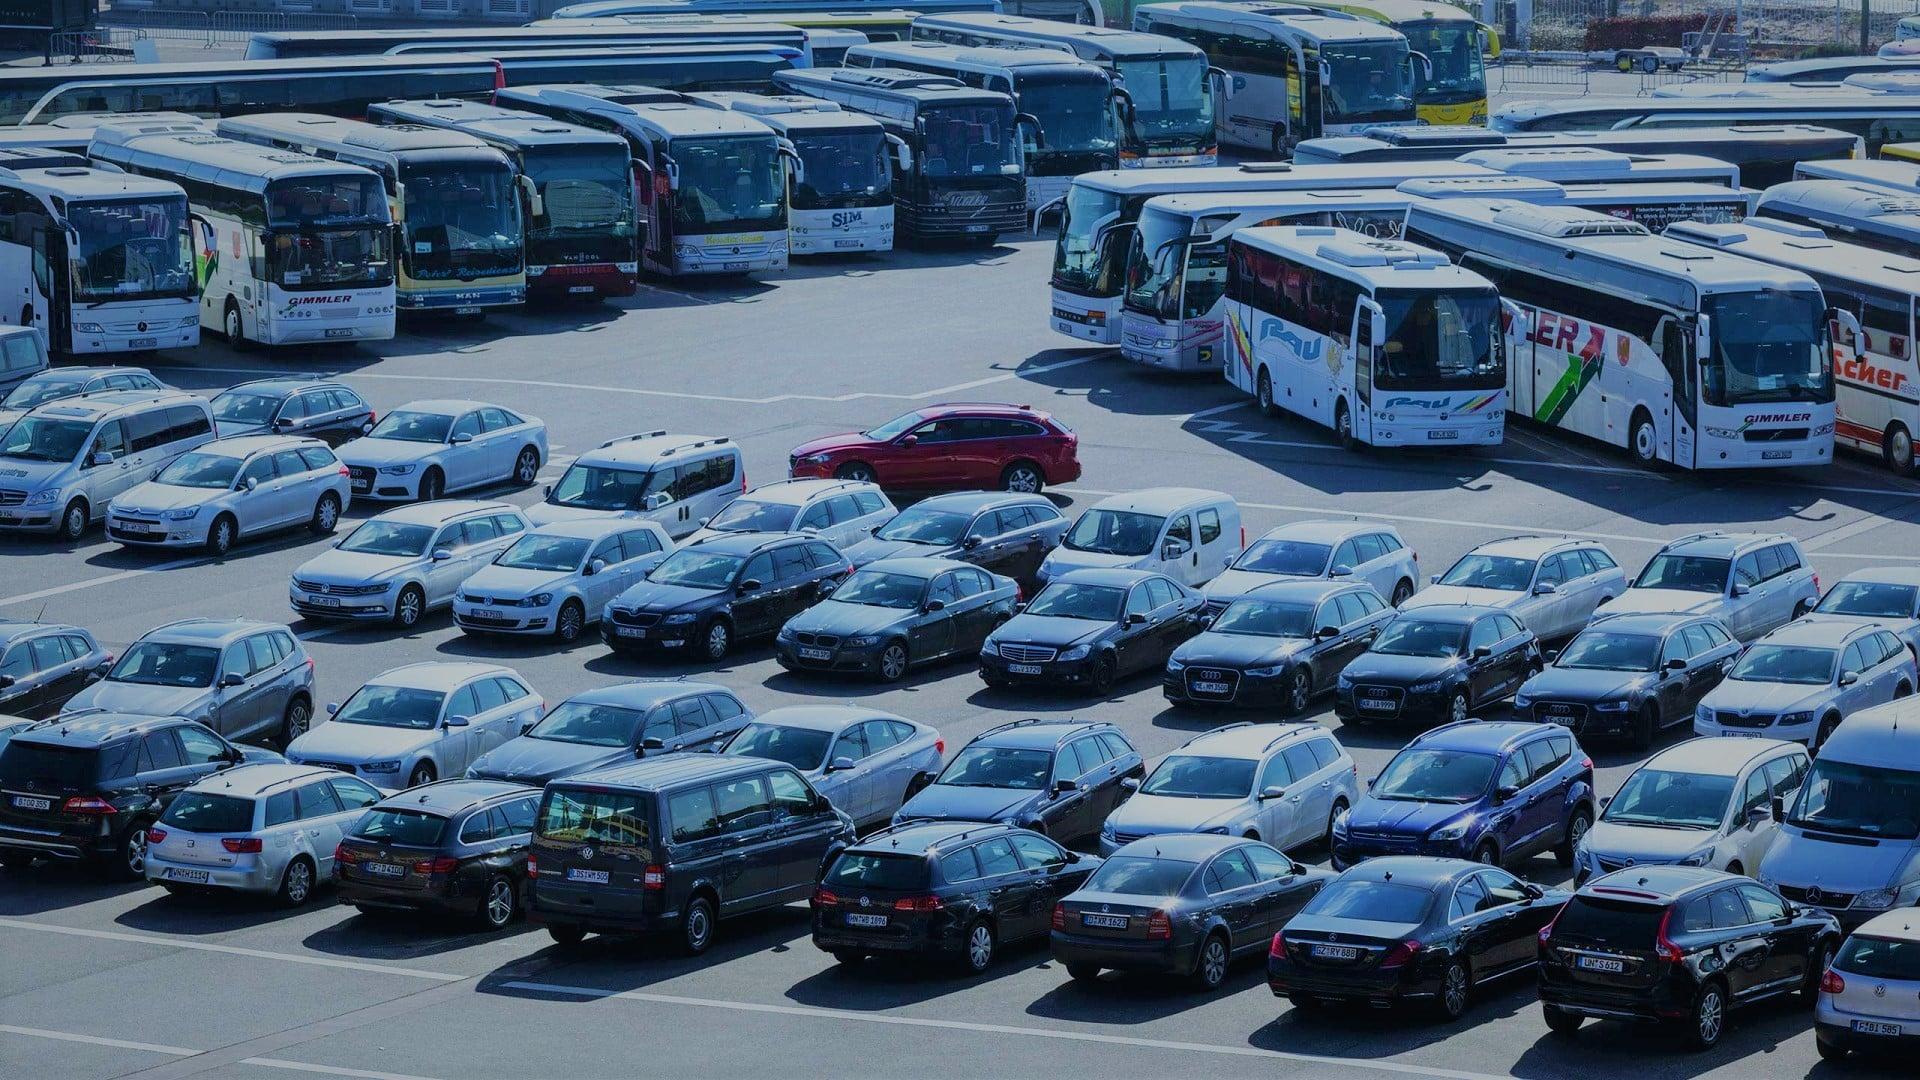 parking lot security